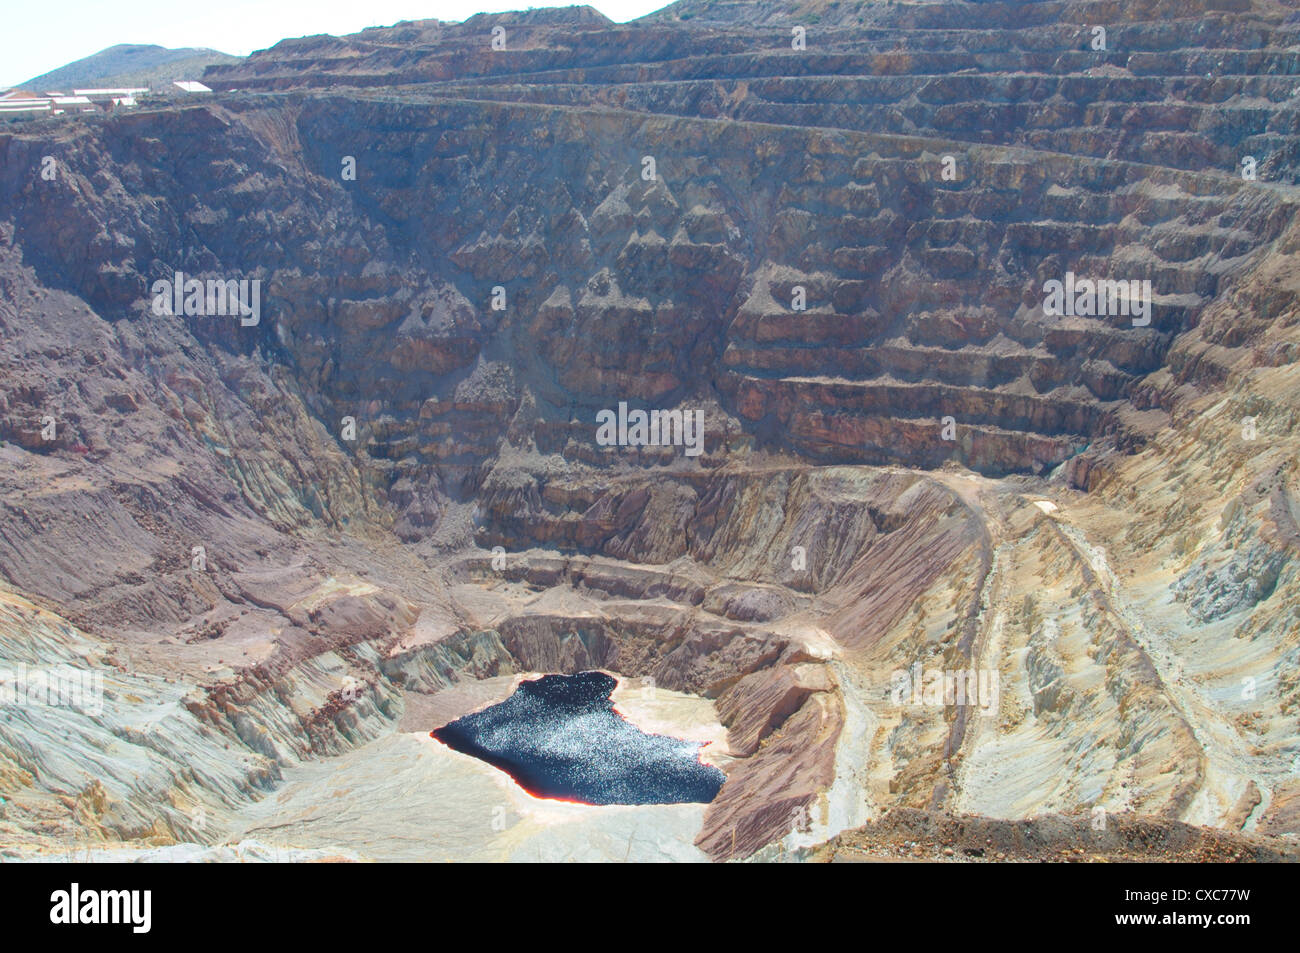 The Lavender open pit copper mine in Bisbee, Arizona, United States of America, North America Stock Photo